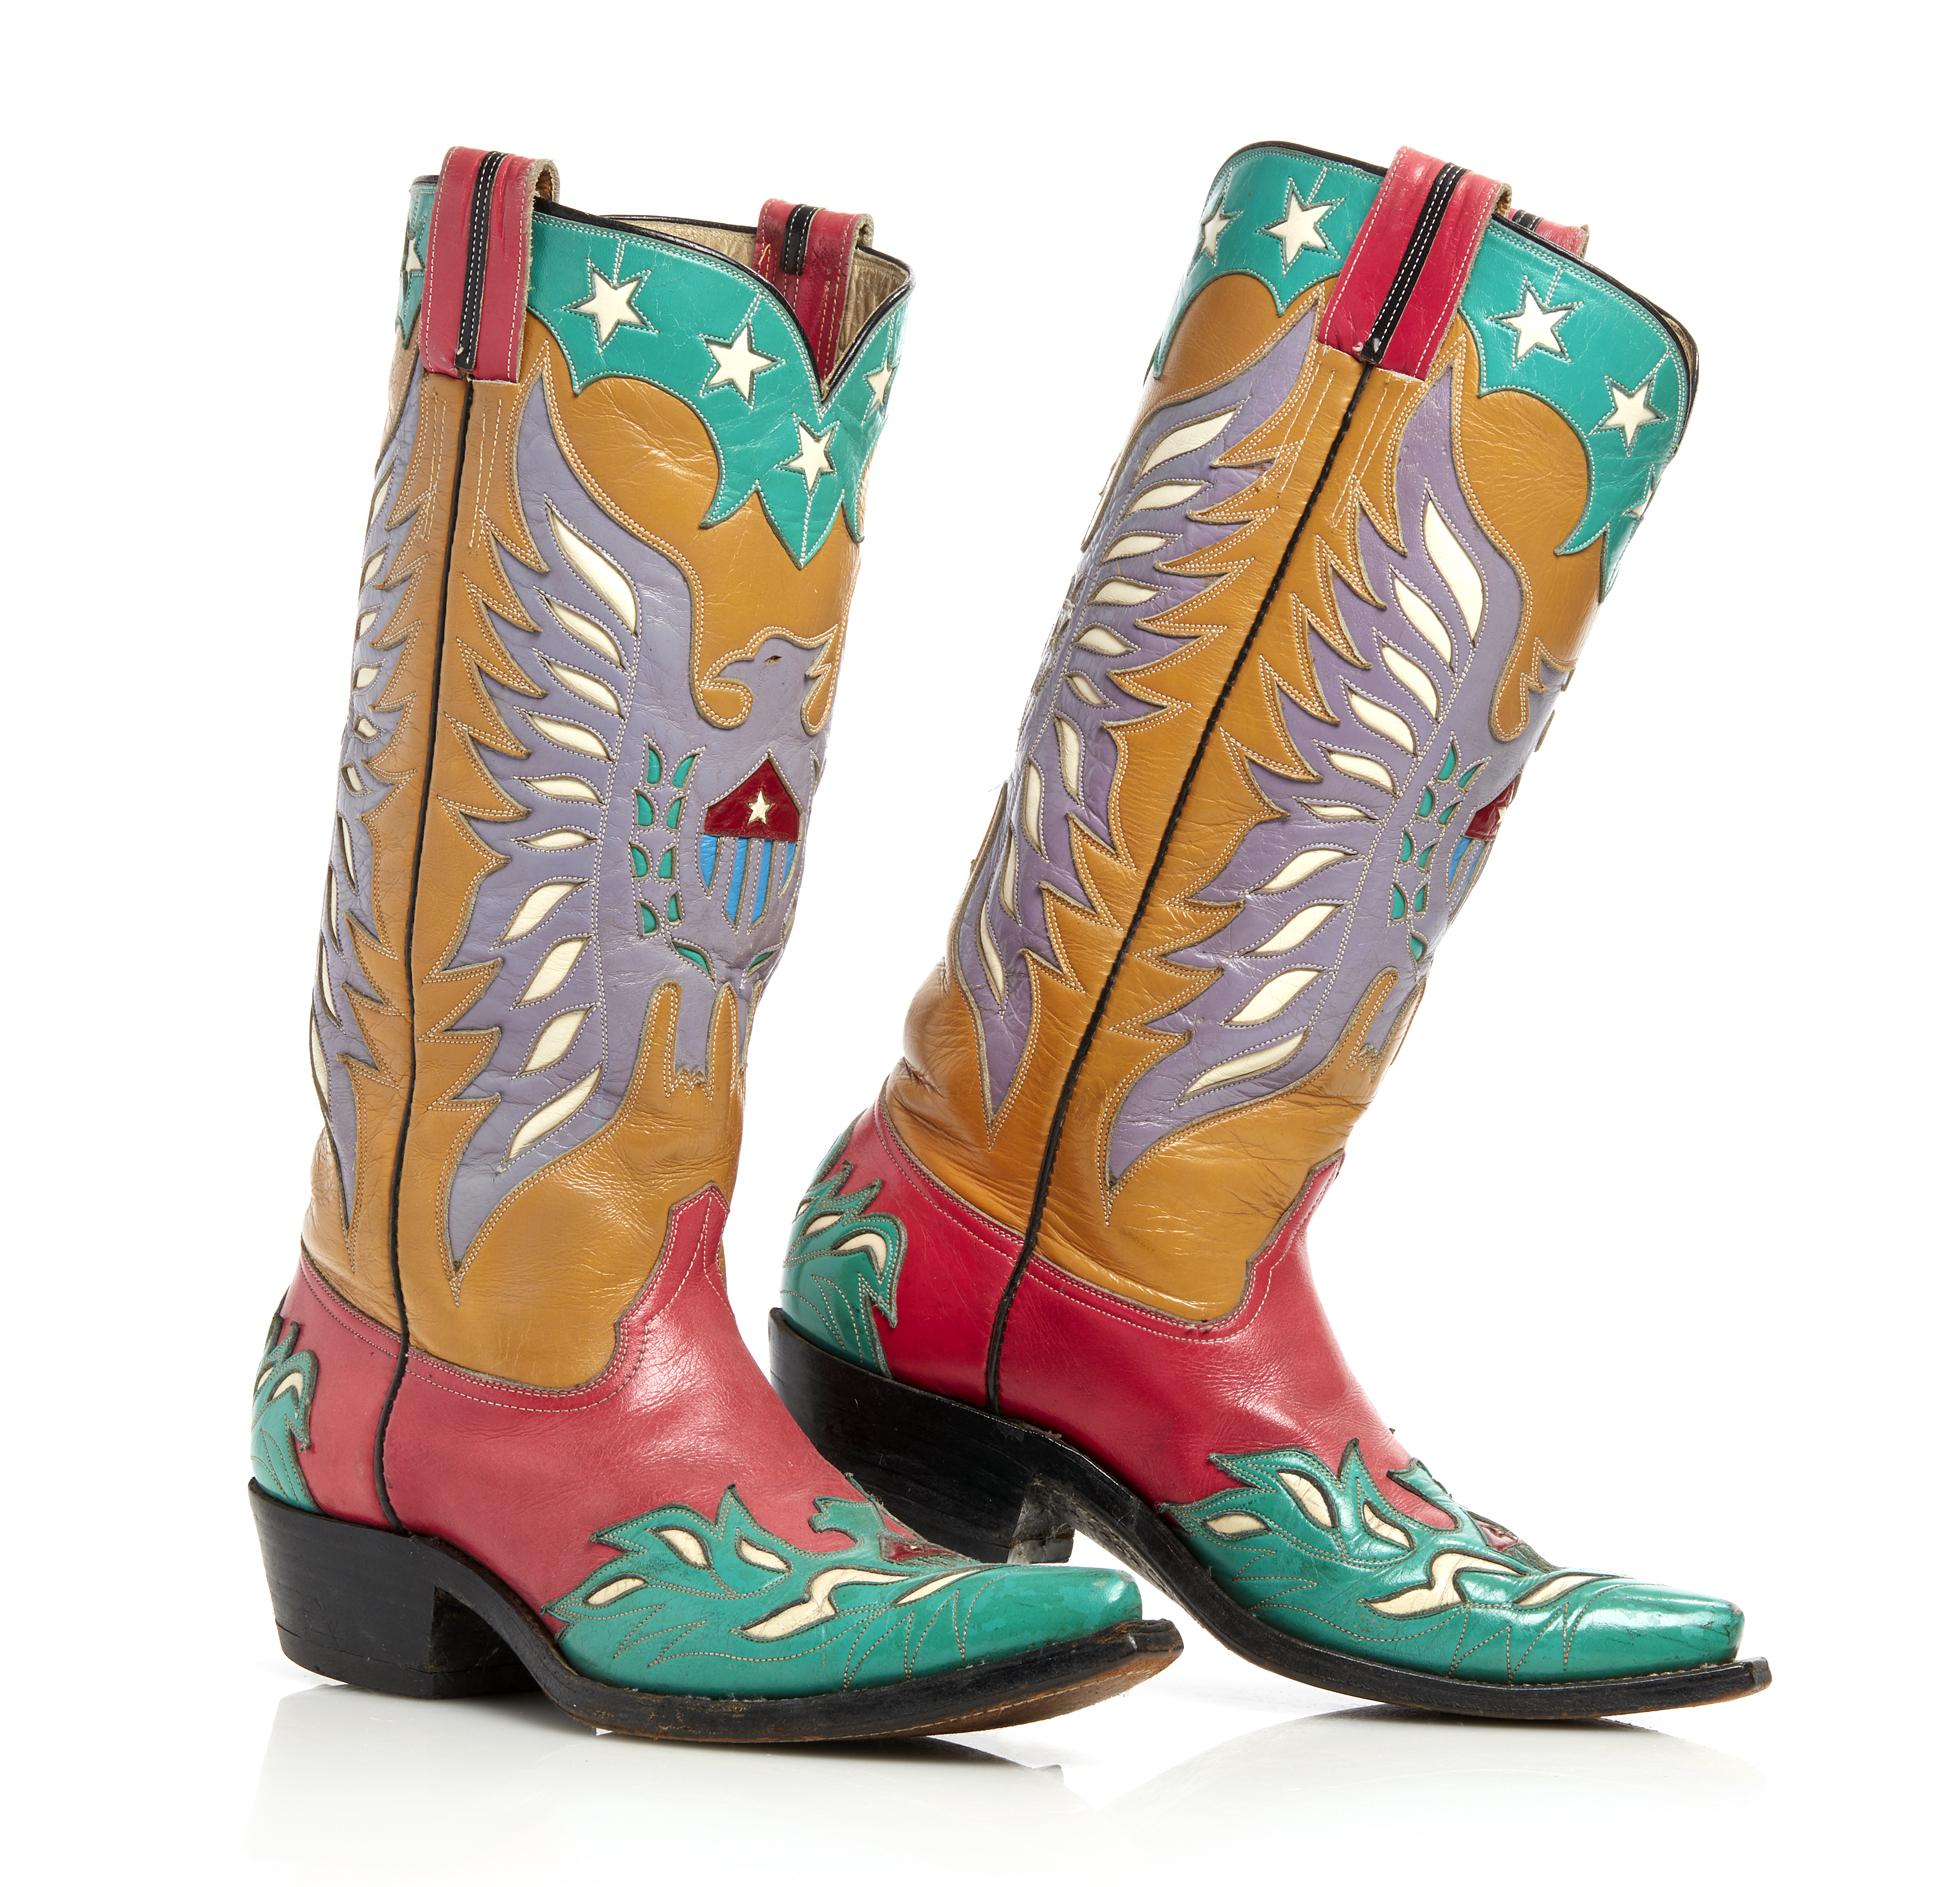 0b790961d85 Unique Vintage Cowboy Boots | Witherell's Auction House